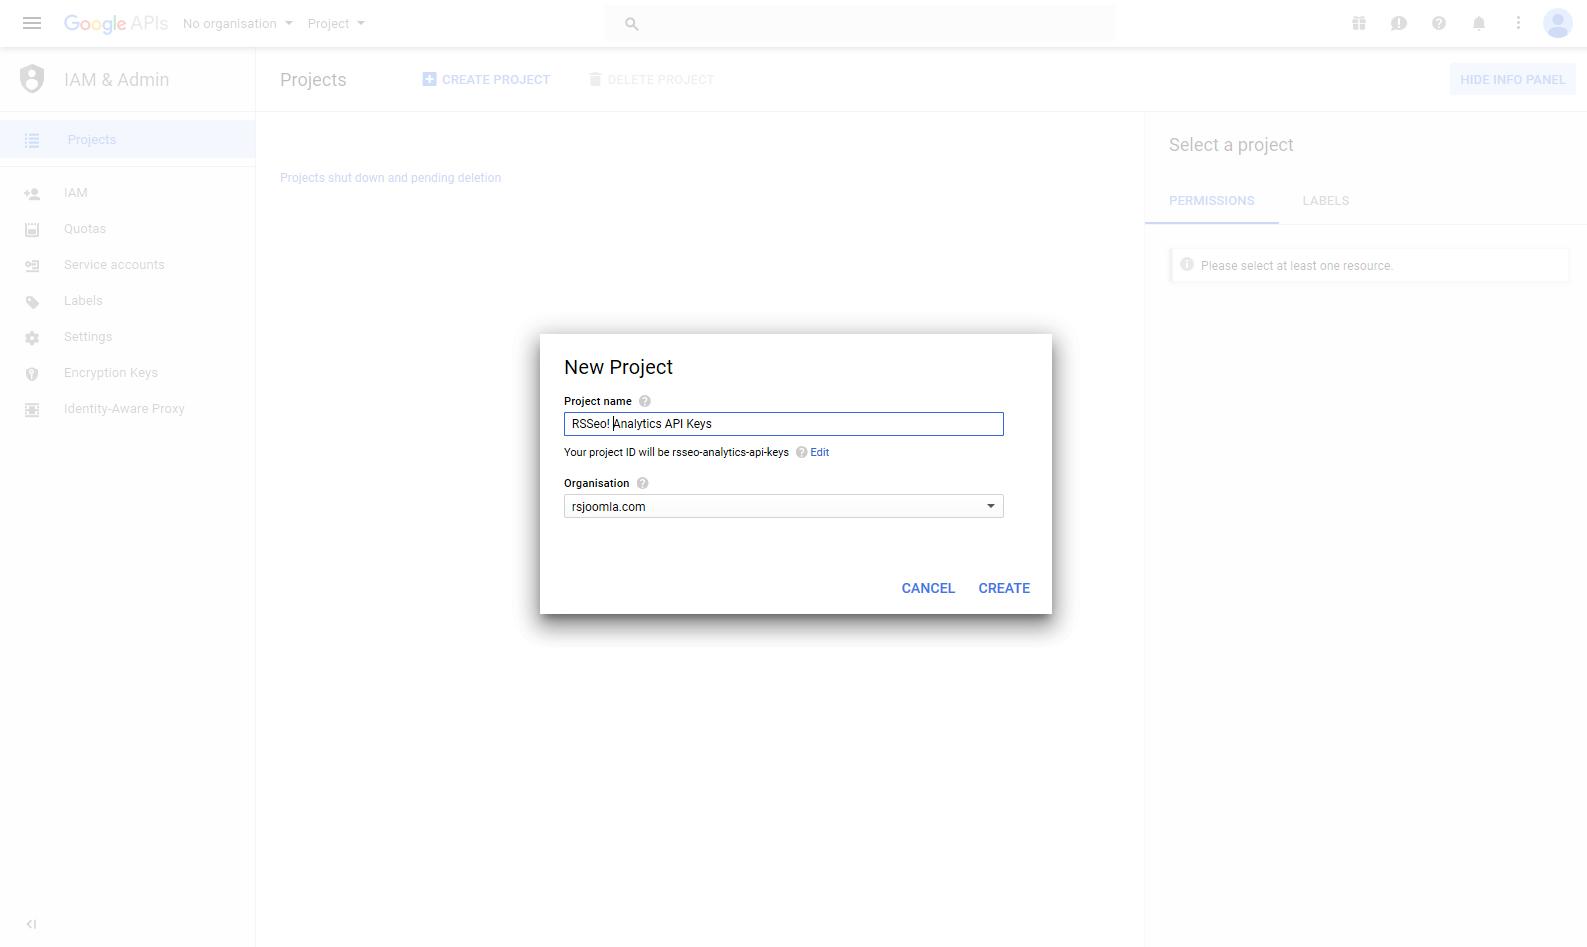 How to get Google Analytics API Keys